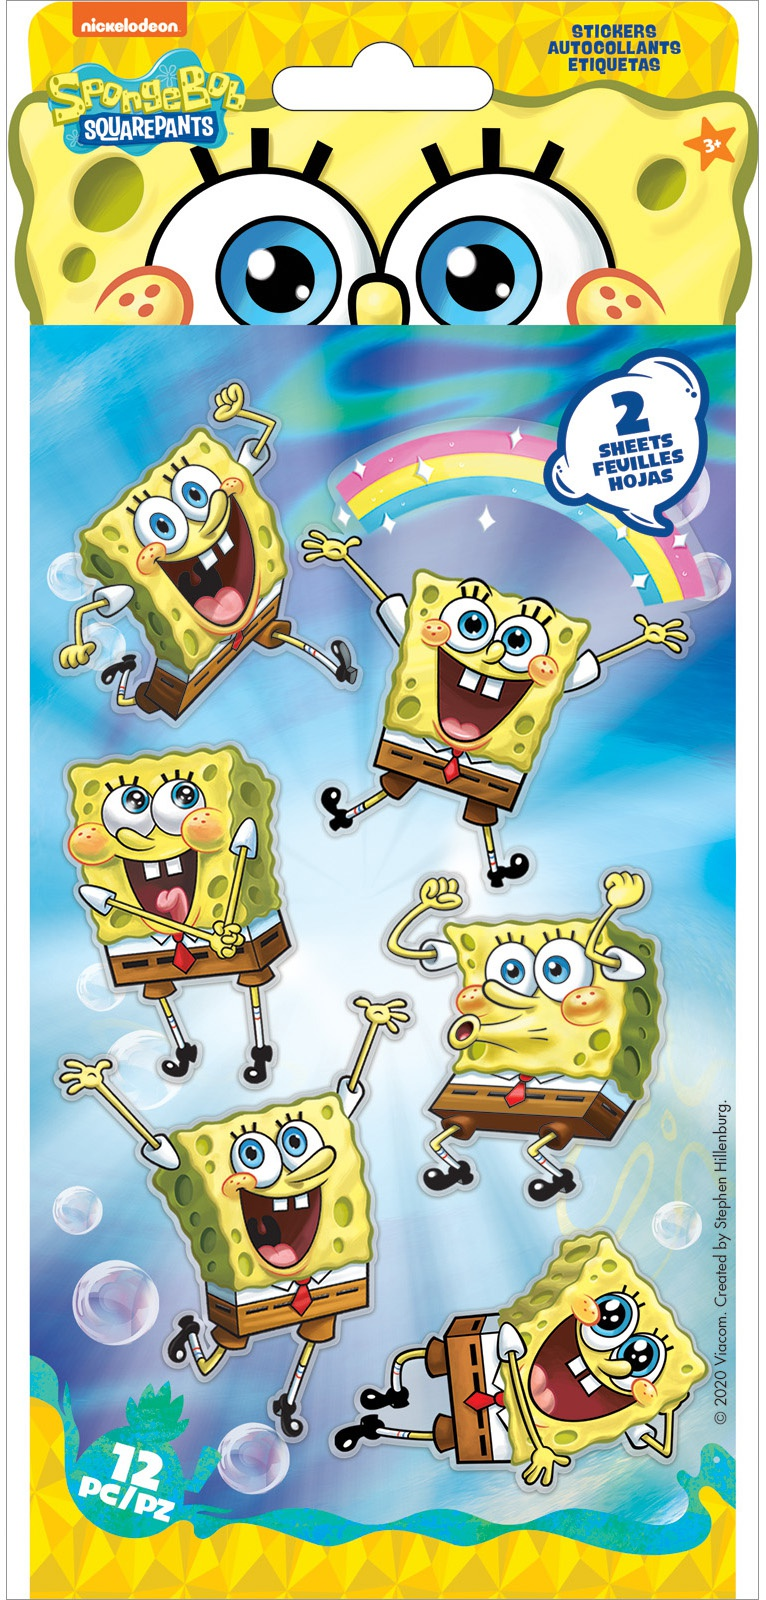 EK Disney Nickelodeon Flat Stickers 2/Sheets-SpongeBob